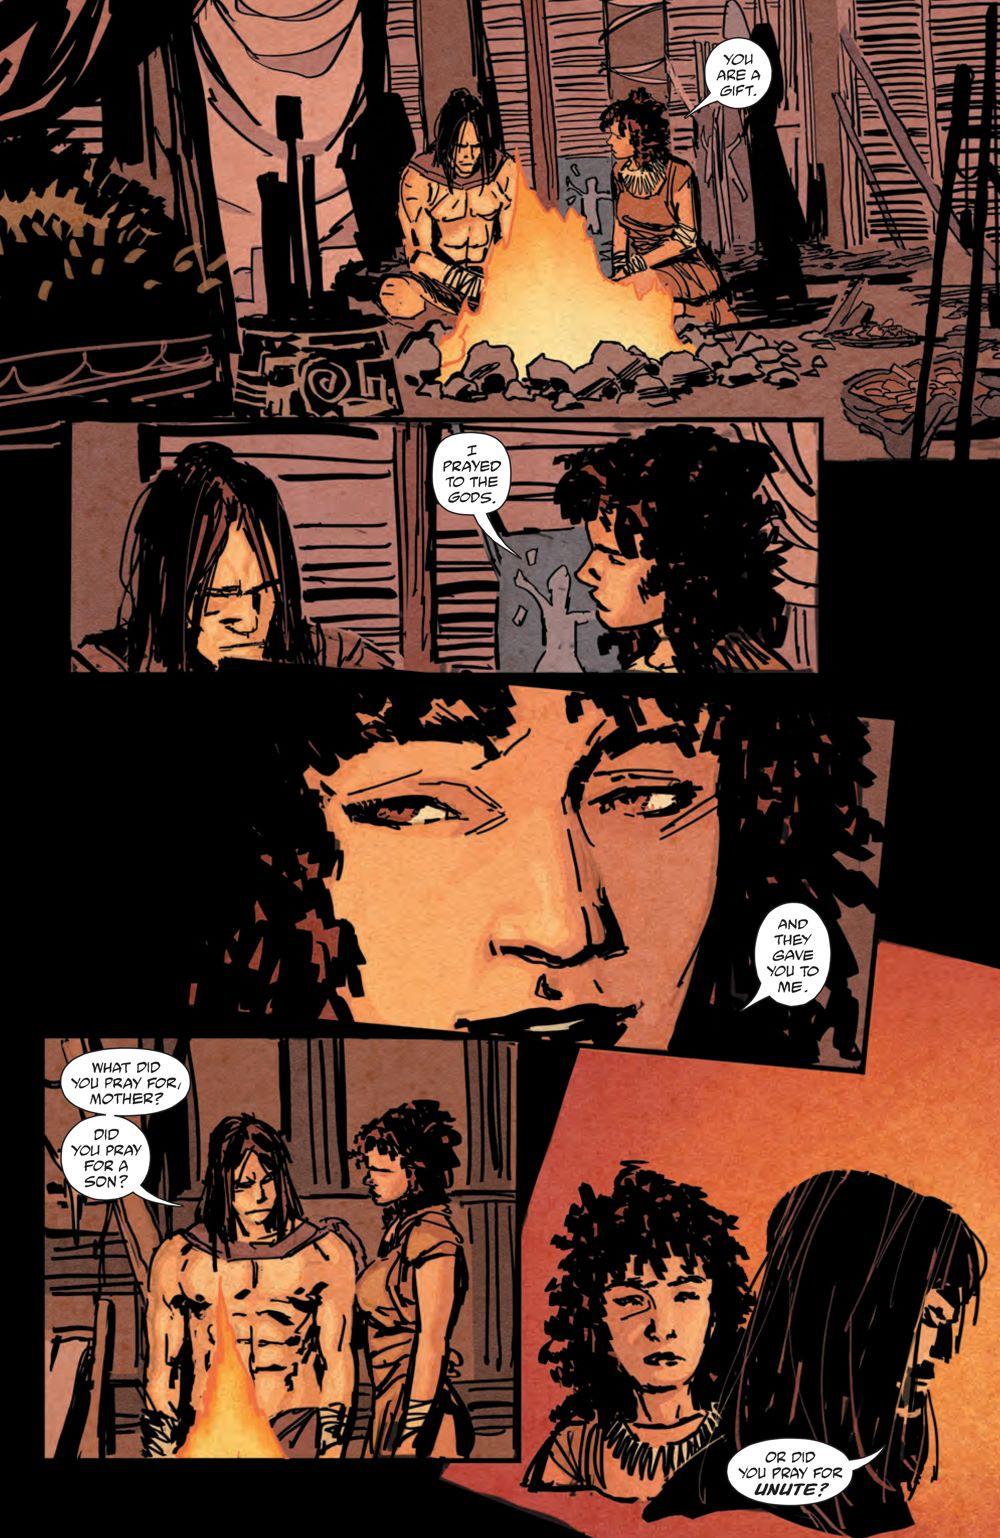 BRZRKR_003_PRESS_7 ComicList Previews: BRZRKR #3 (OF 12)